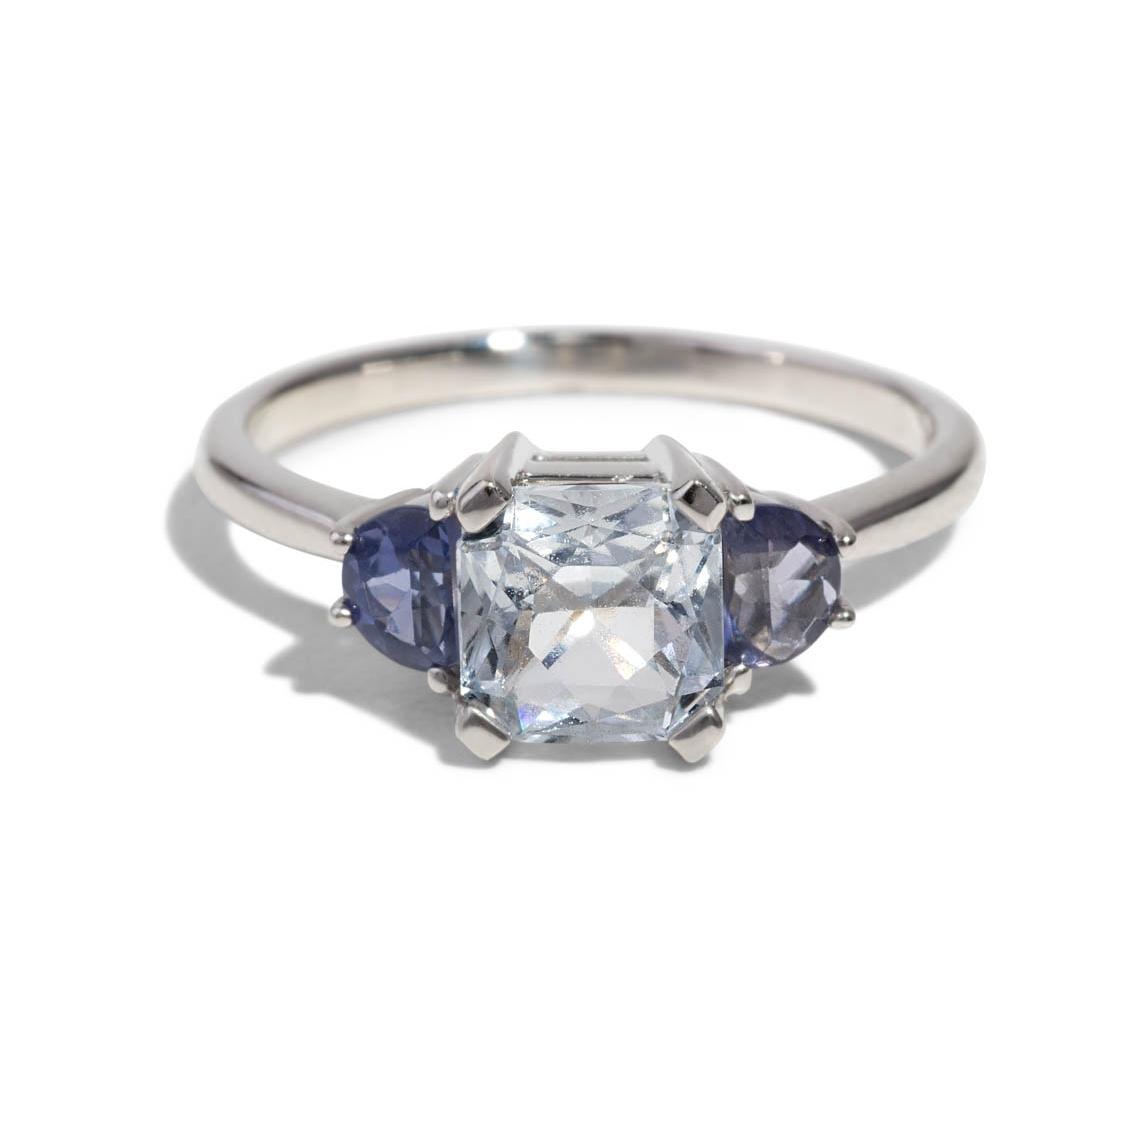 Bario Neal Custom Rose-Cut Diamond and Sapphire Cluster Ring